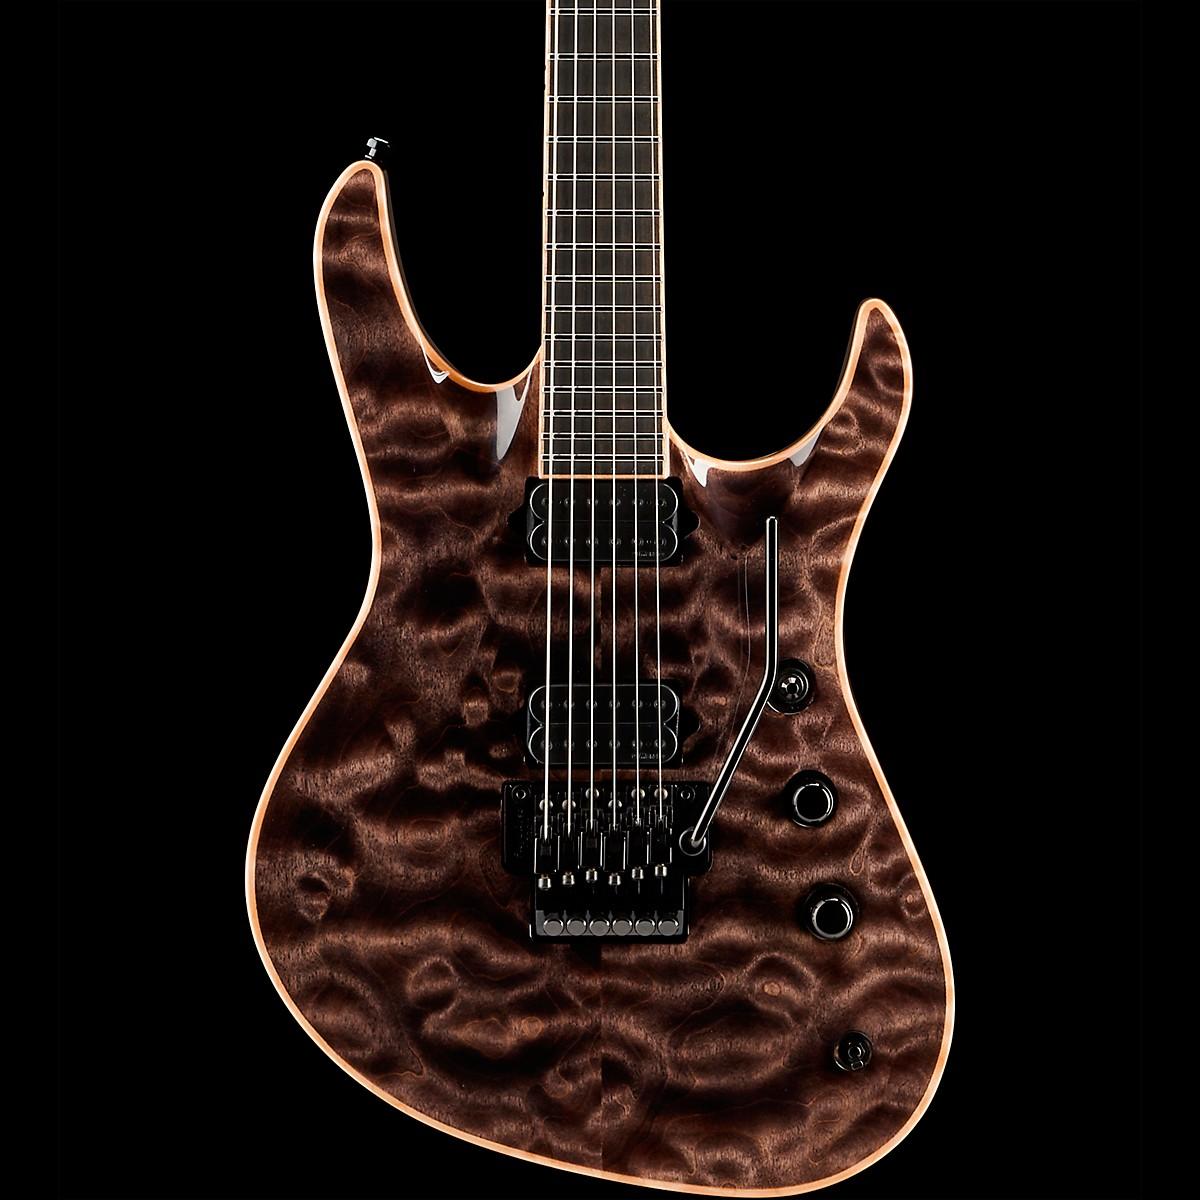 Jackson Chris Broderick Soloist Electric Guitar